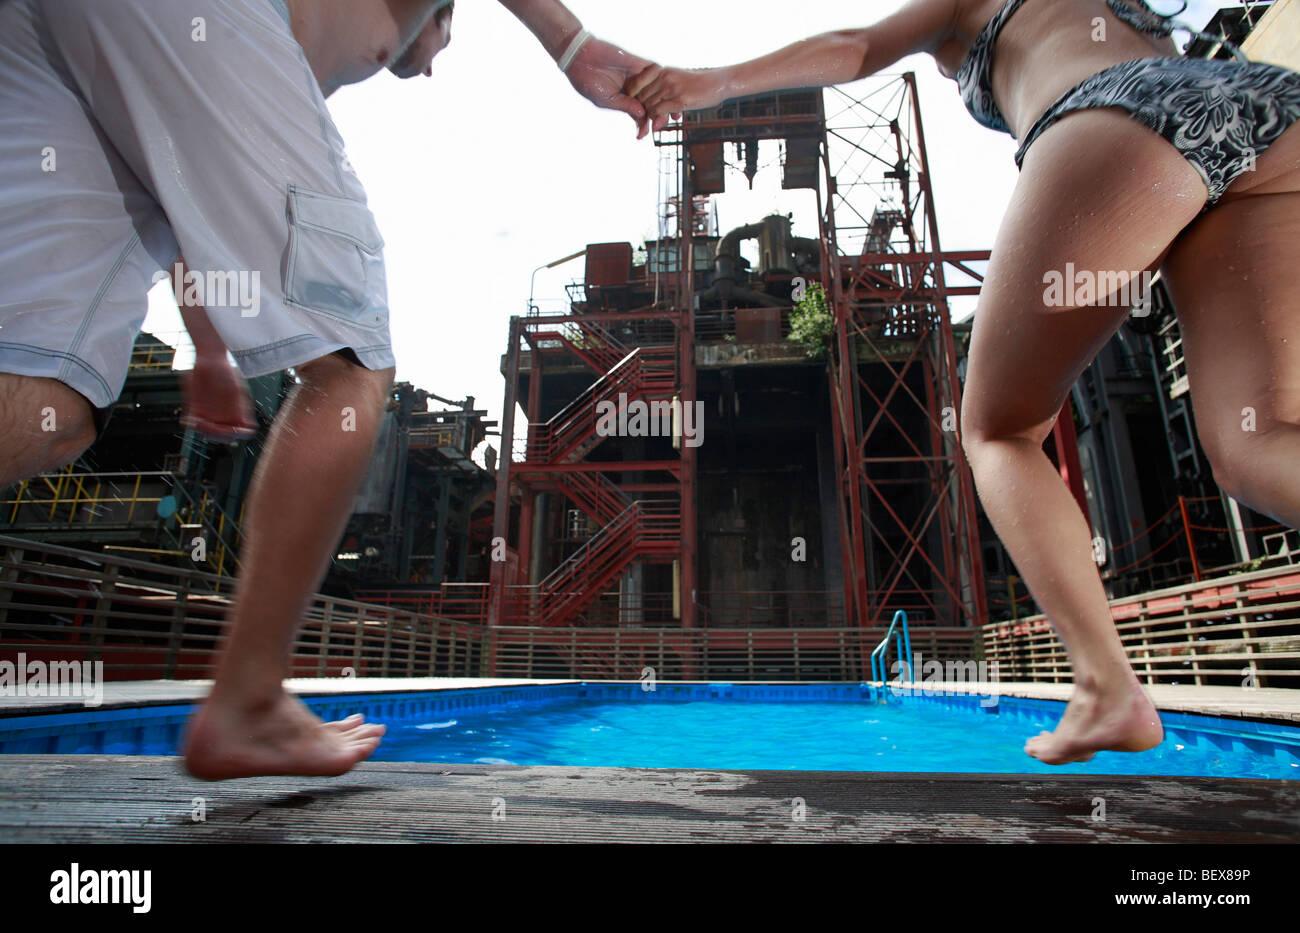 Swimming Pool auf Zollverein Coal Mine Industrial Complex Stockfoto